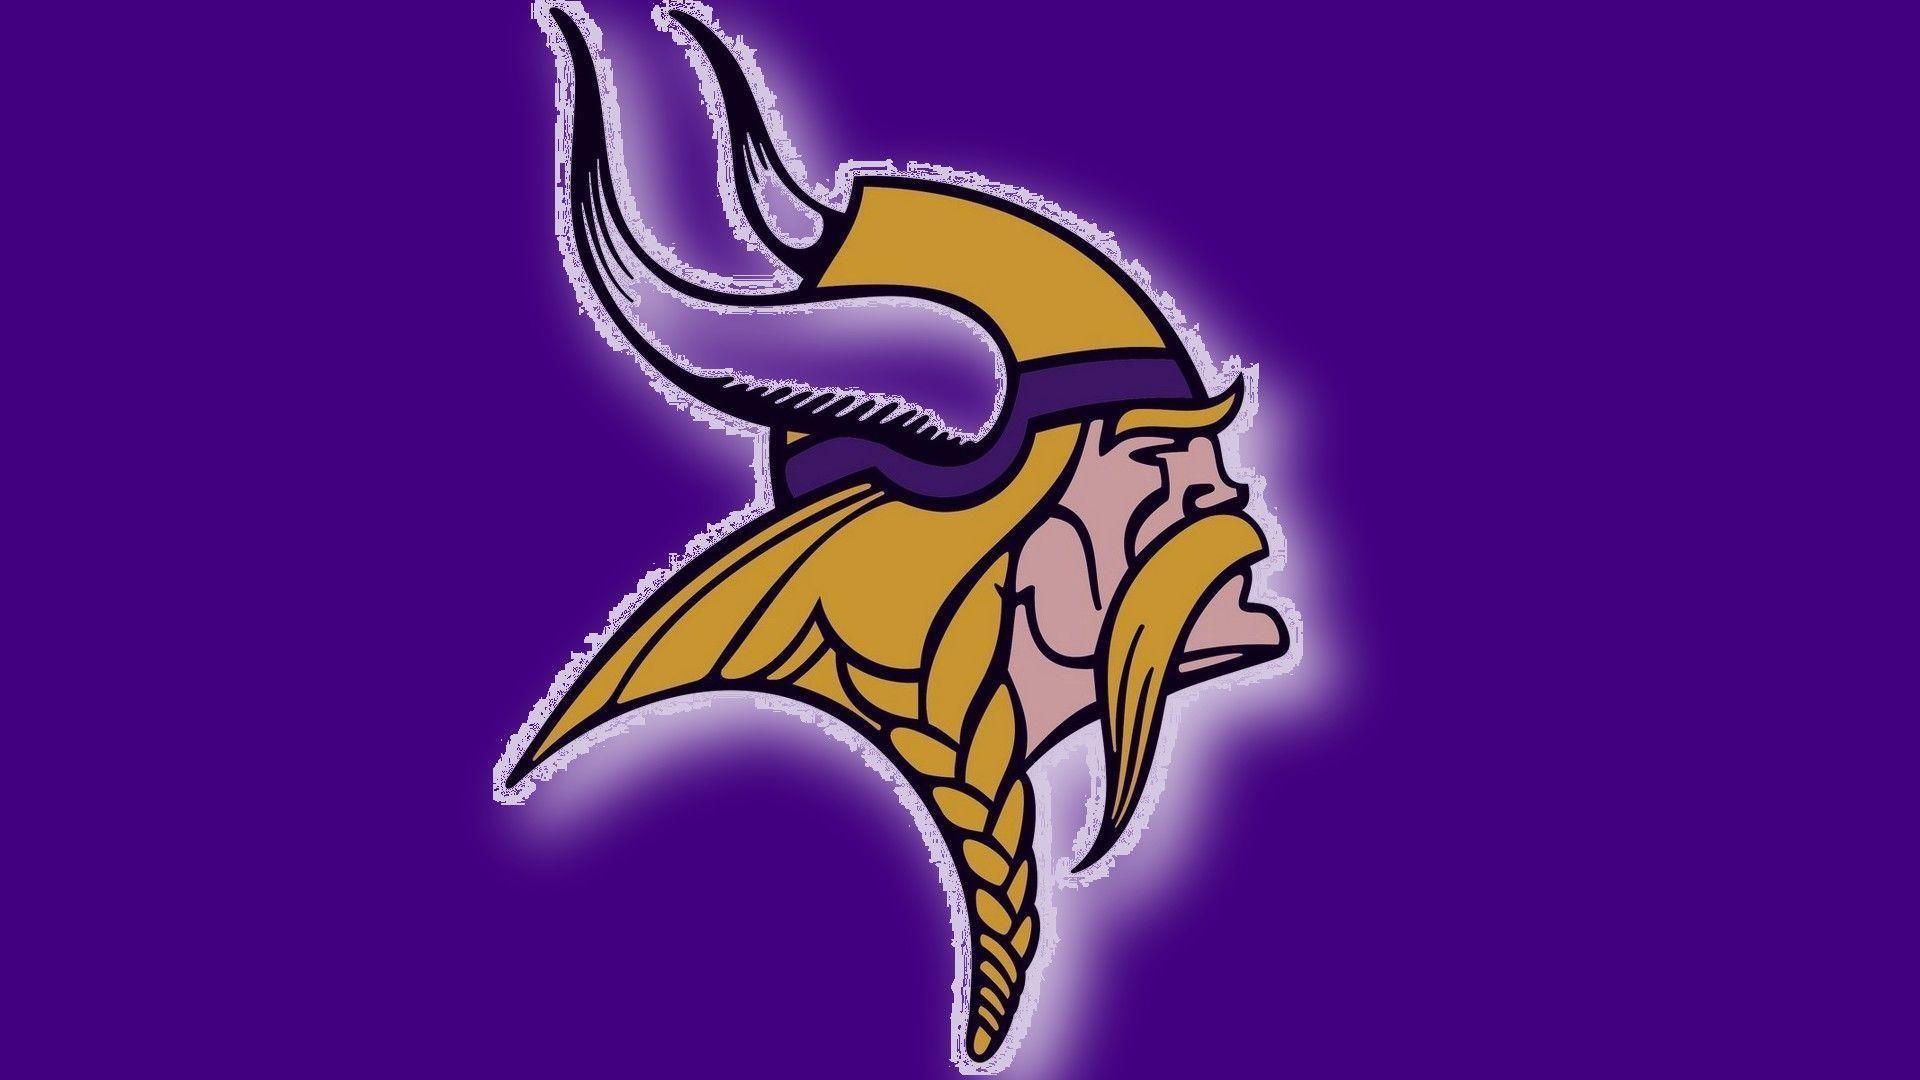 Minnesota Vikings background picture hd